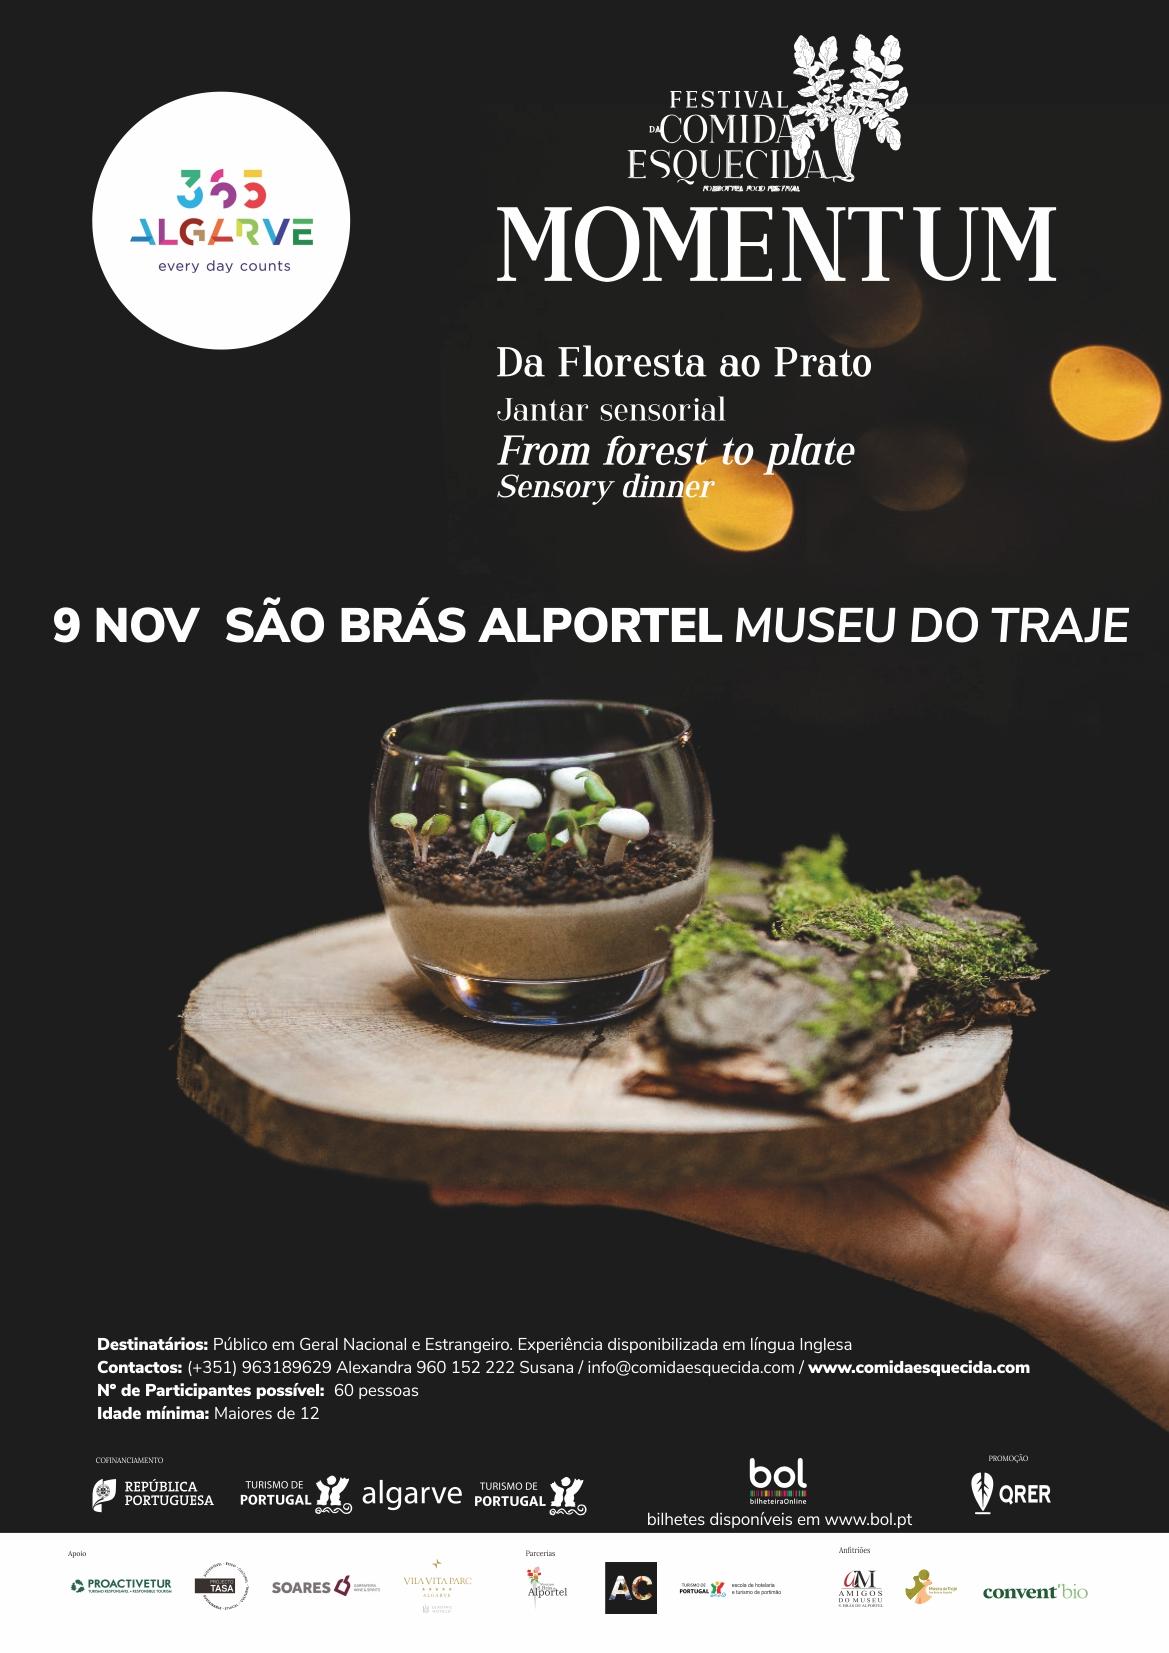 cartaz de momentum, festival de comida esquecida